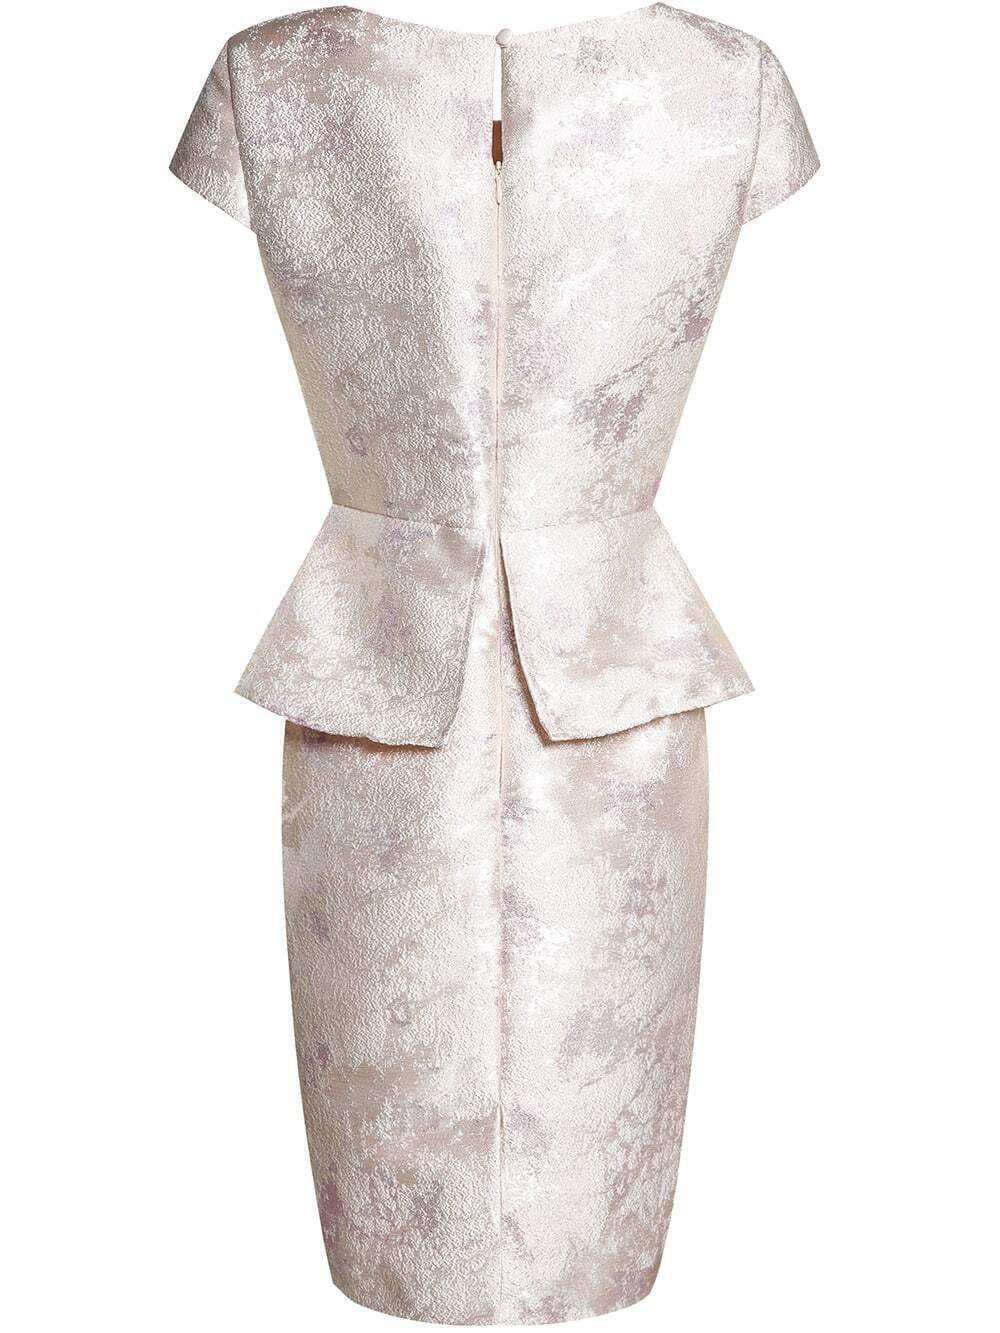 Plus Size Lace Nude Irregular Layered Peplum Dress - Sheinline